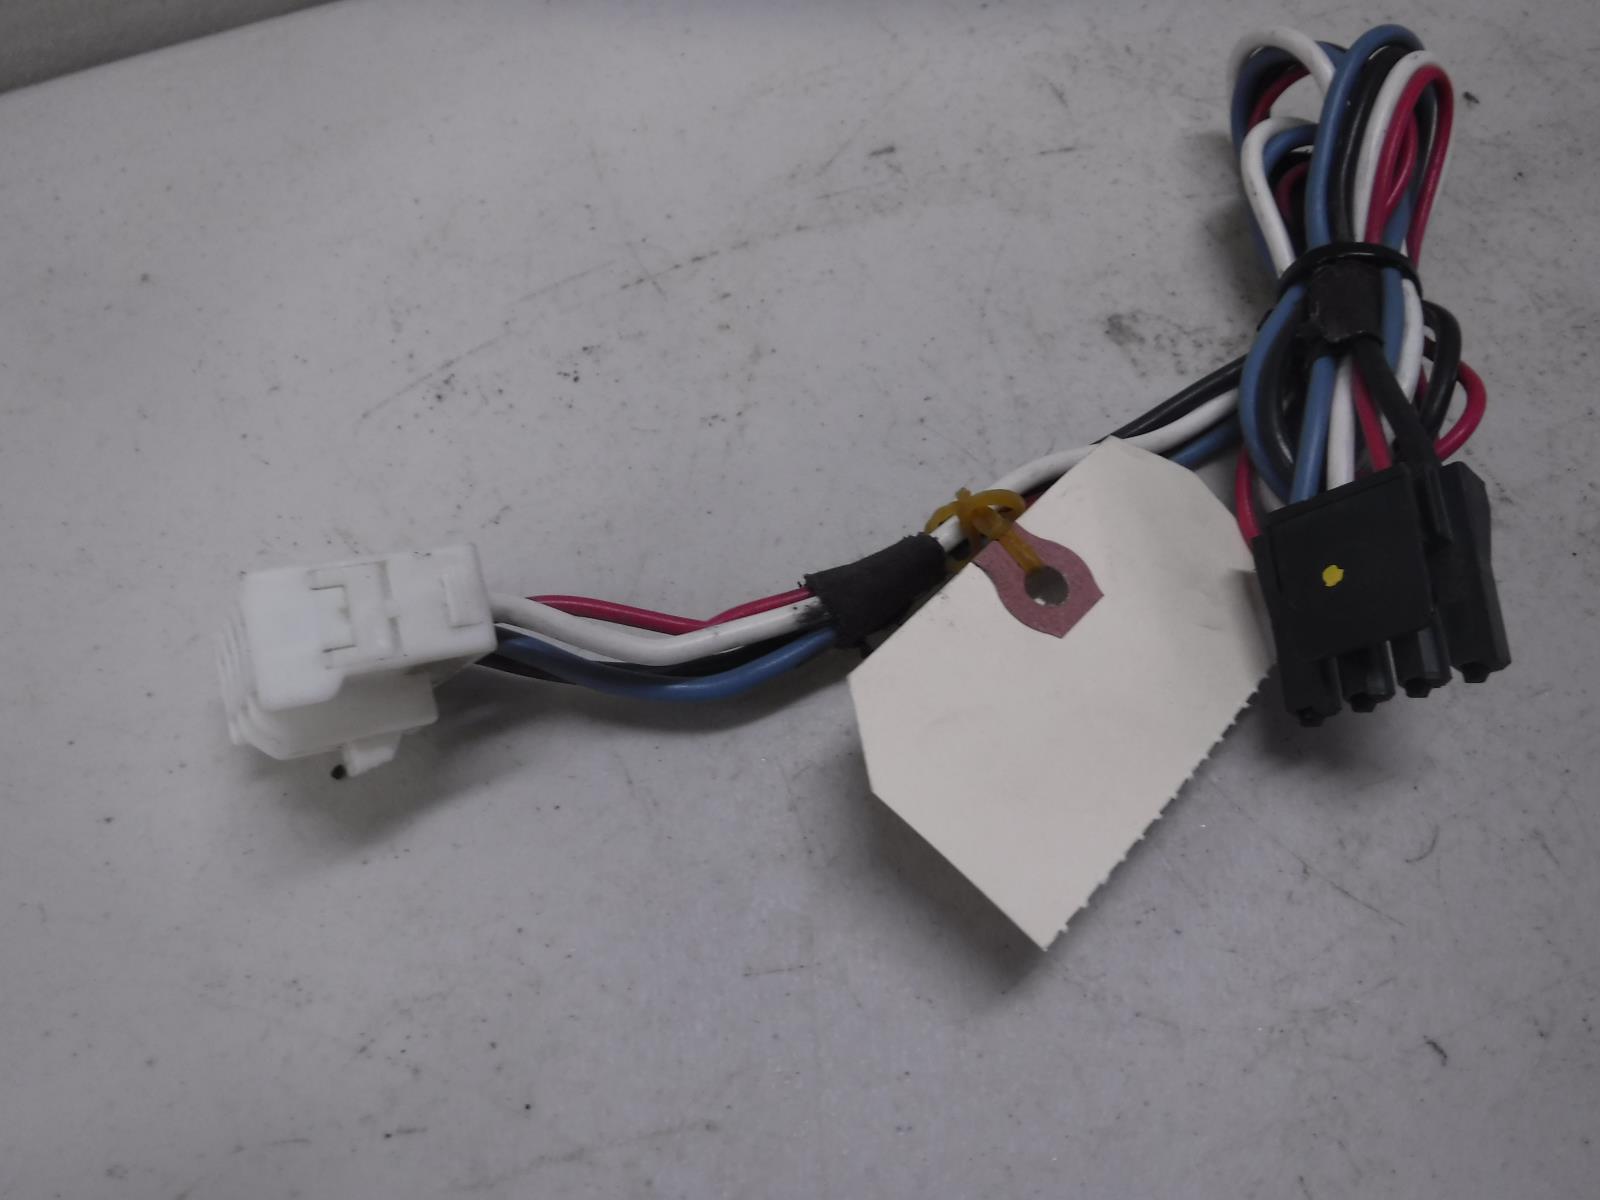 2004 Dodge Ram Trailer Brake Wiring from kyozoufs.blob.core.windows.net